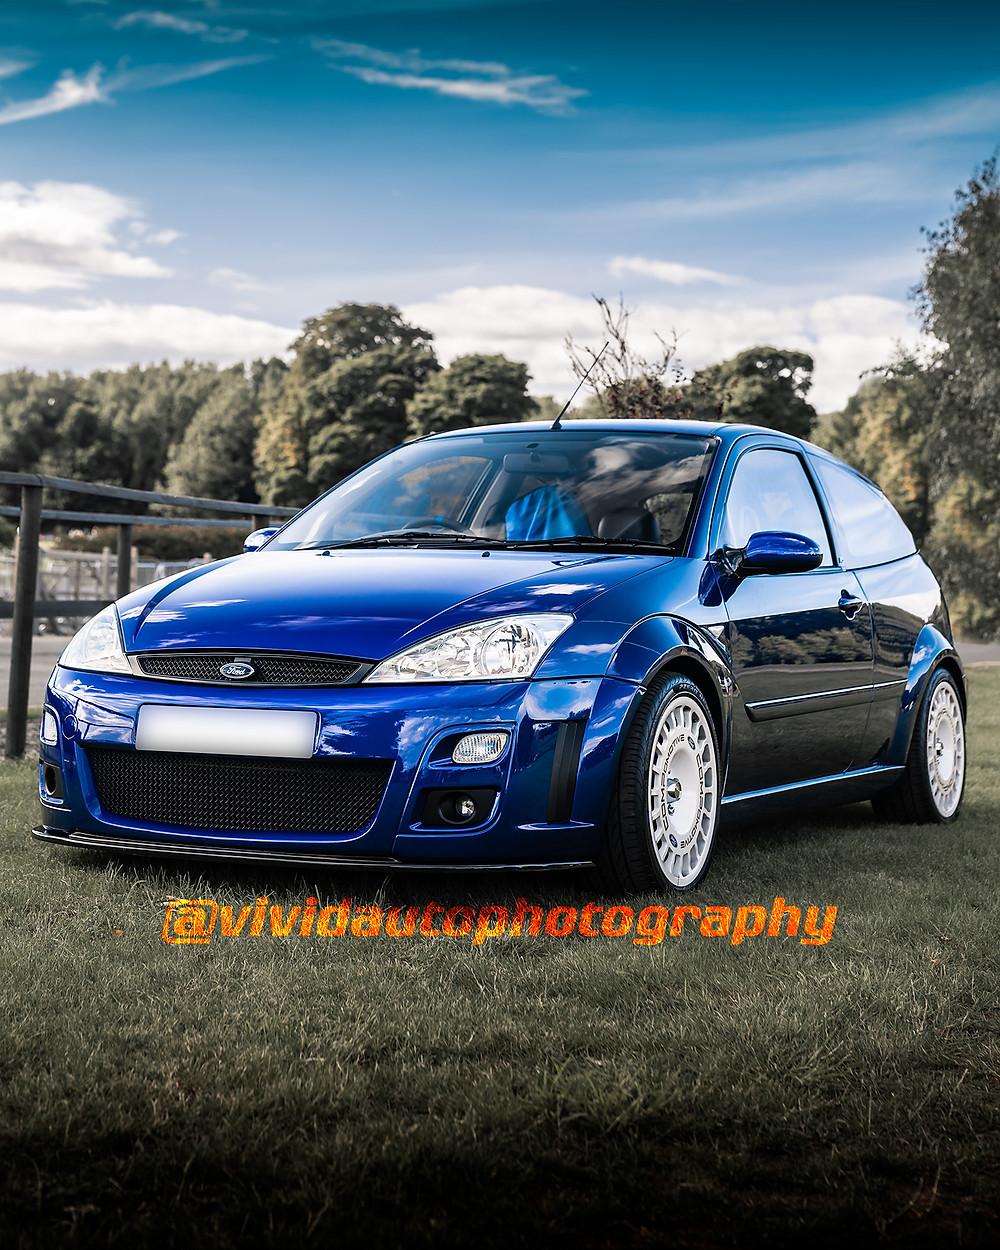 Ford Focus RS MK1 | Imperial Blue | Oulton Park